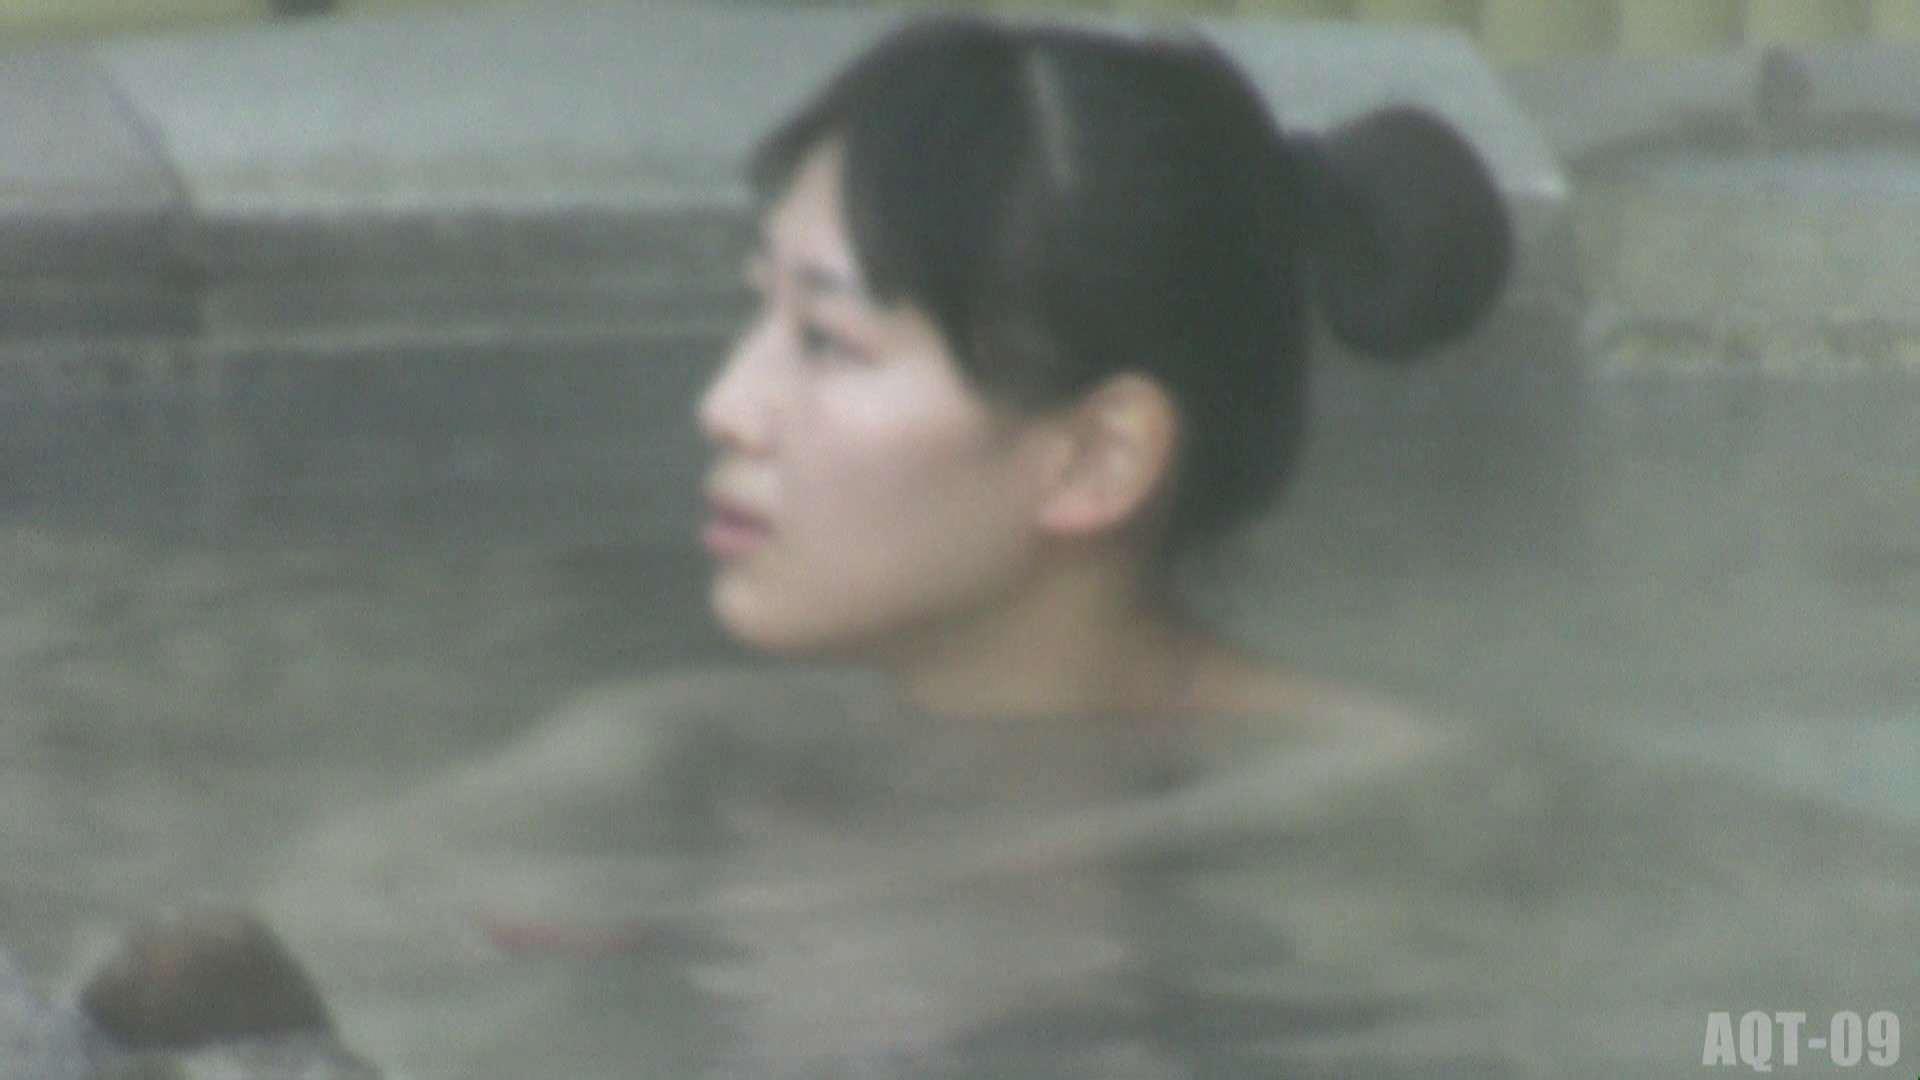 Aquaな露天風呂Vol.785 OLのプライベート  12pic 3